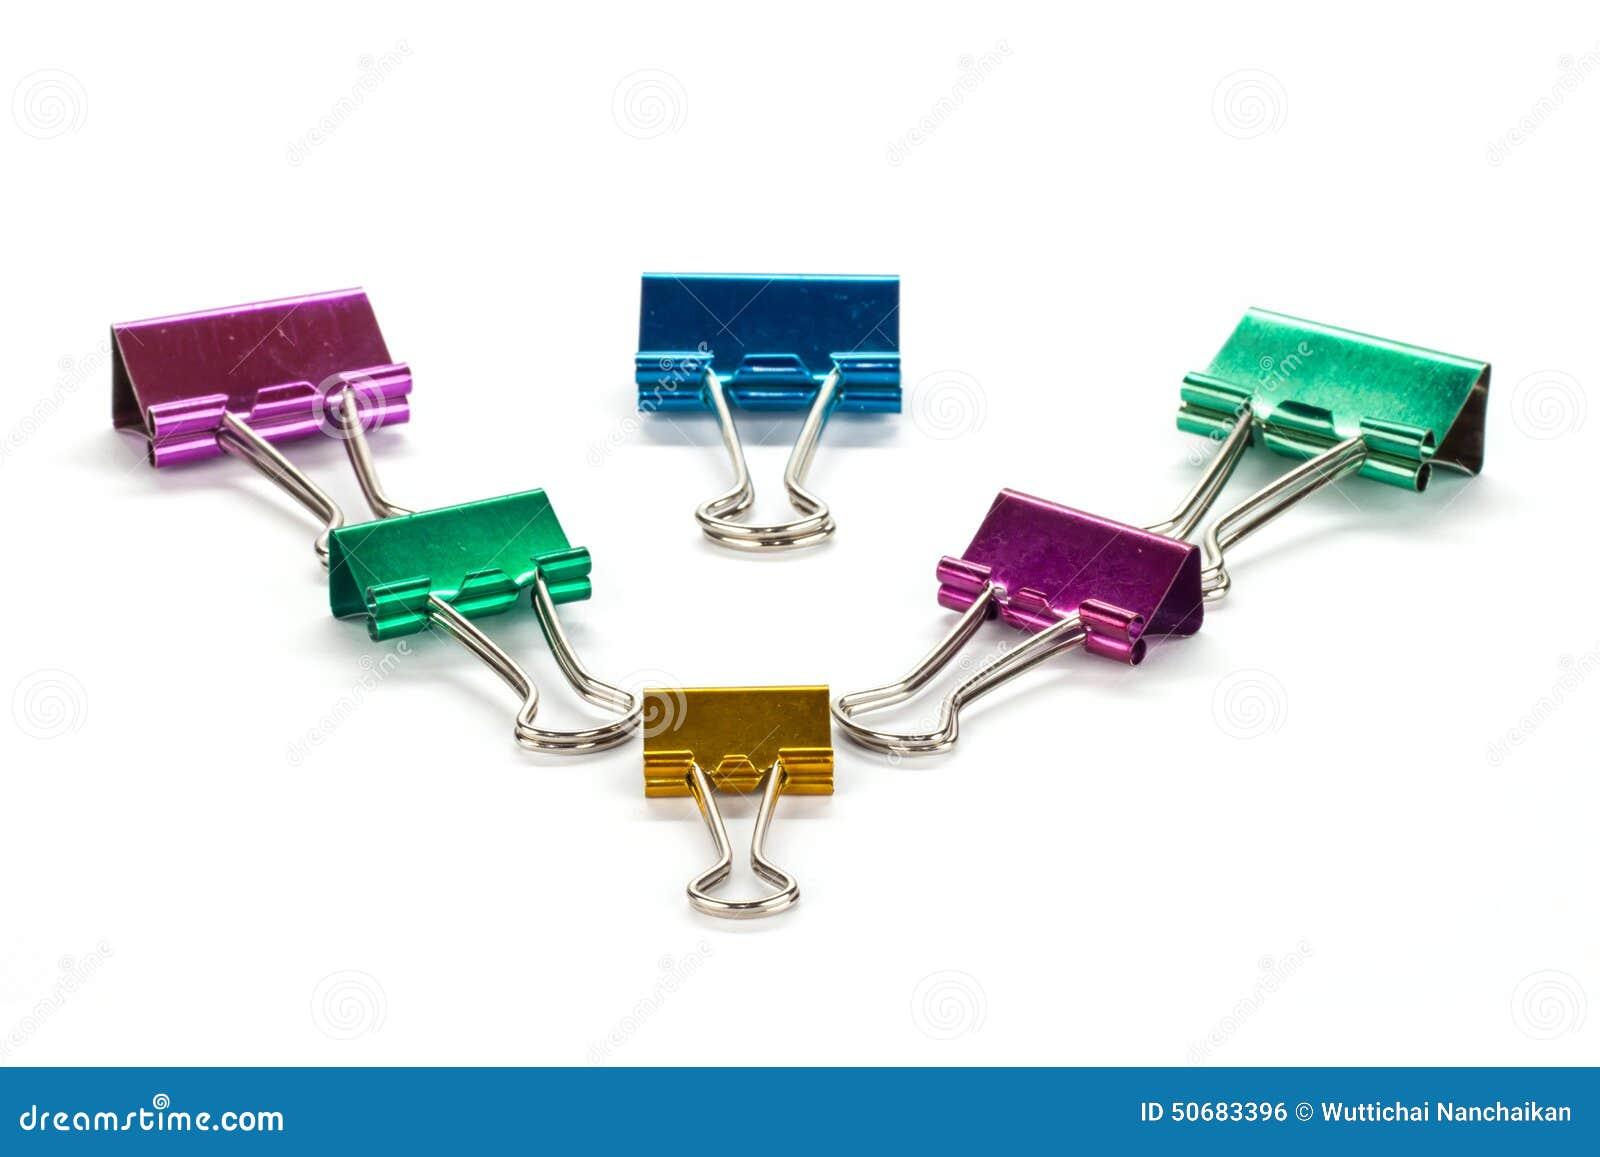 Download 五颜六色黏合剂的夹子 库存照片. 图片 包括有 装箱, 纸张, 对象, 商业, backarrow, 金属 - 50683396